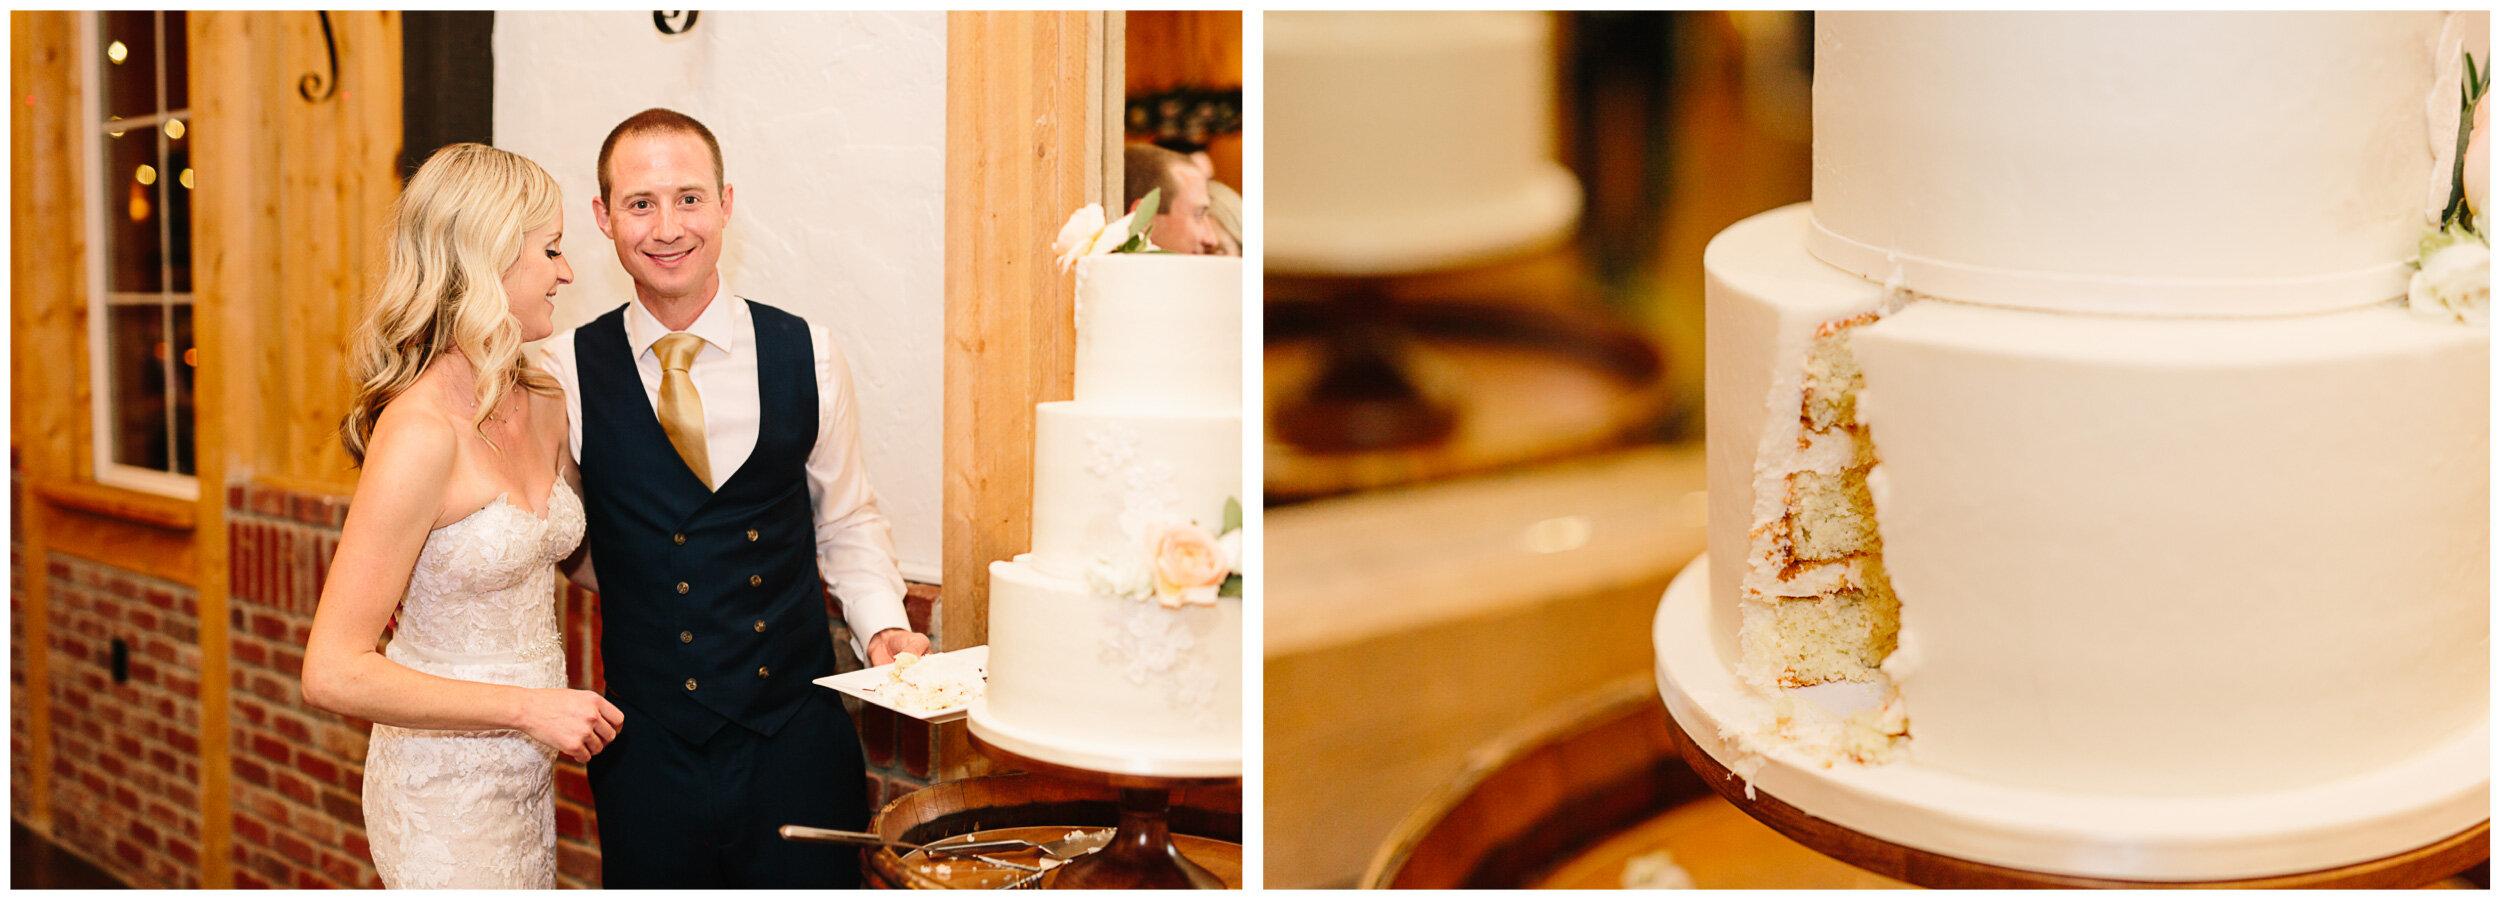 larkspur_colorado_wedding_71.jpg